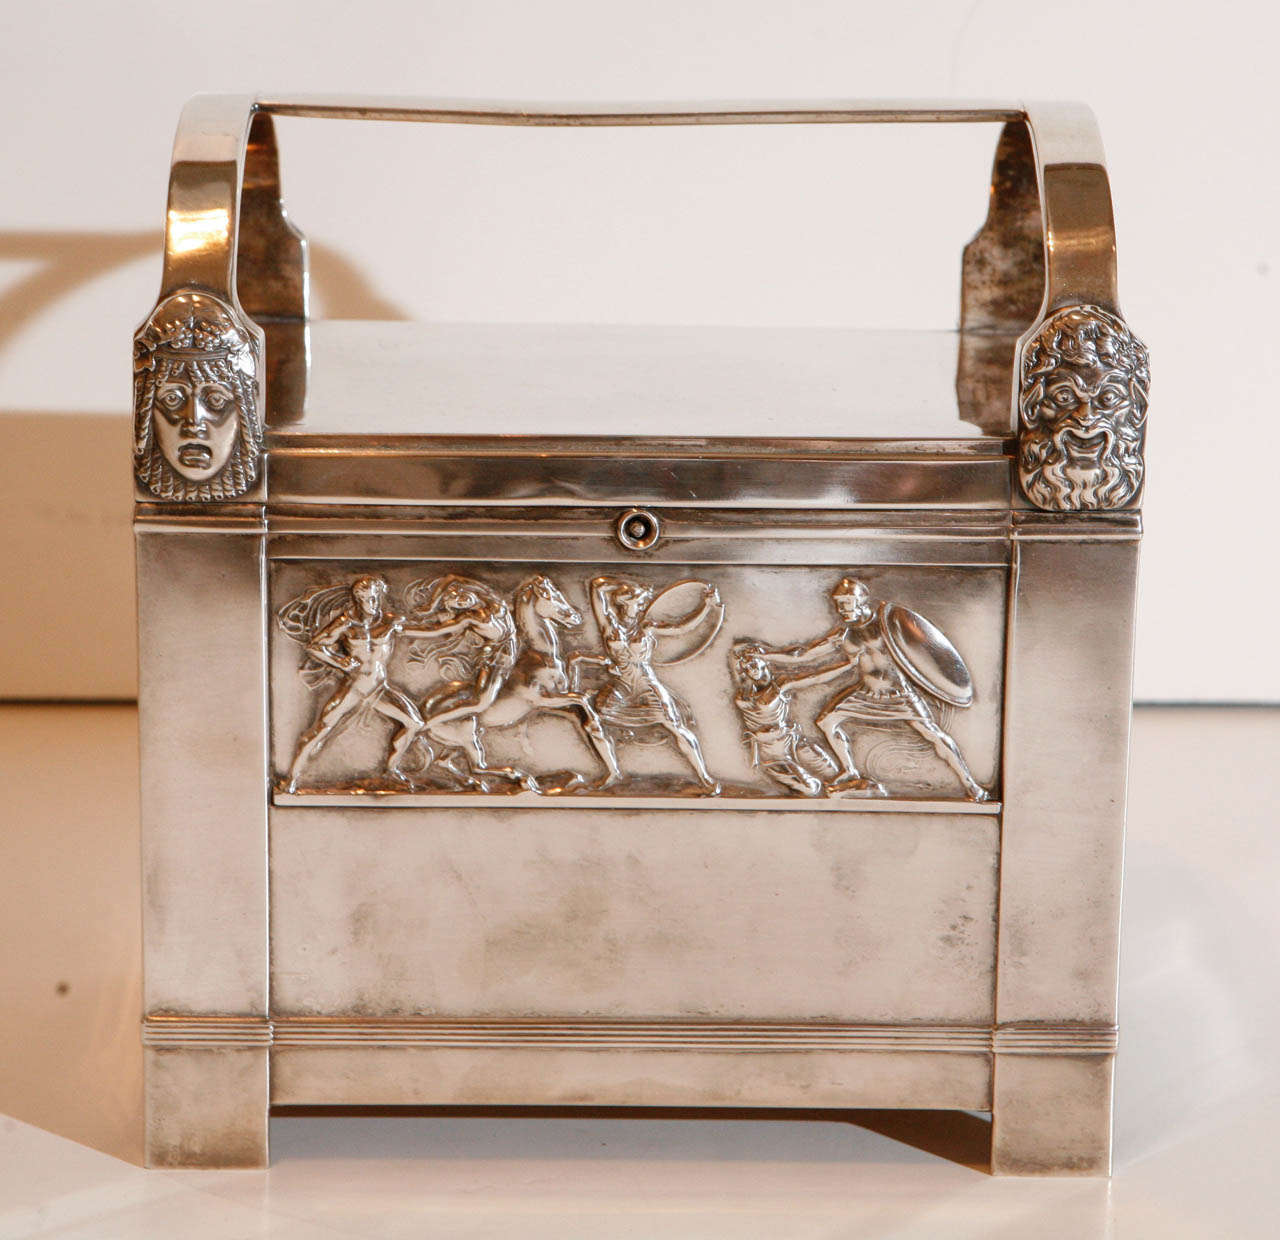 Art Deco Italian Art-Deco Humidor For Sale